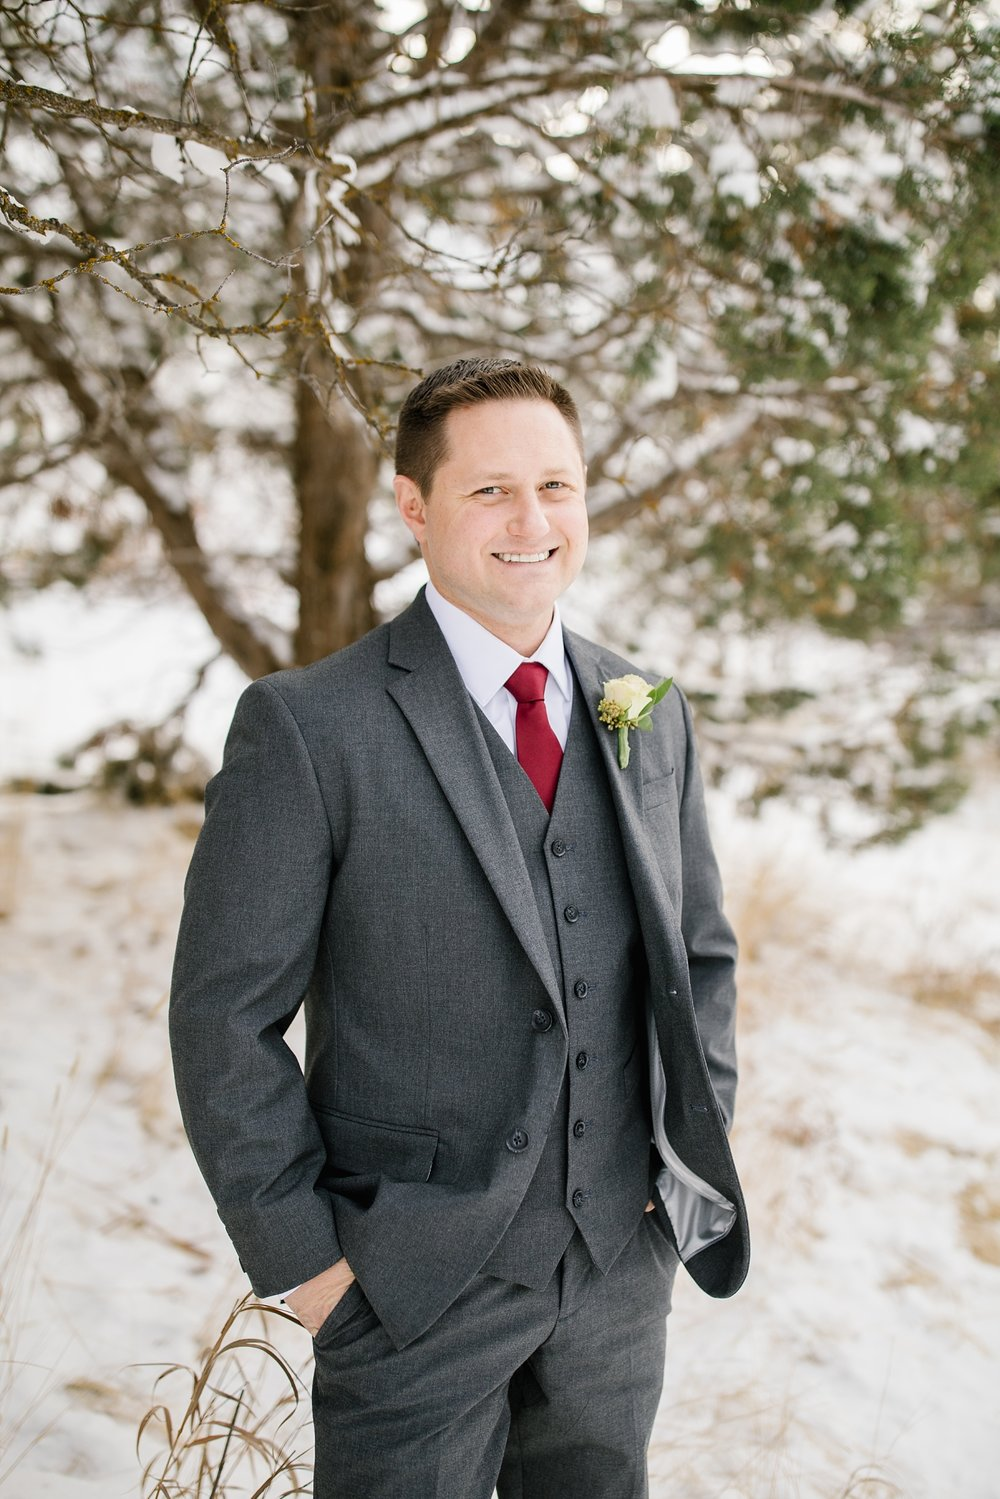 SSBridals-6_Lizzie-B-Imagery-Utah-Wedding-Photographer-Logan-Temple-Logan-Canyon-Mountain-Horse-Session.jpg